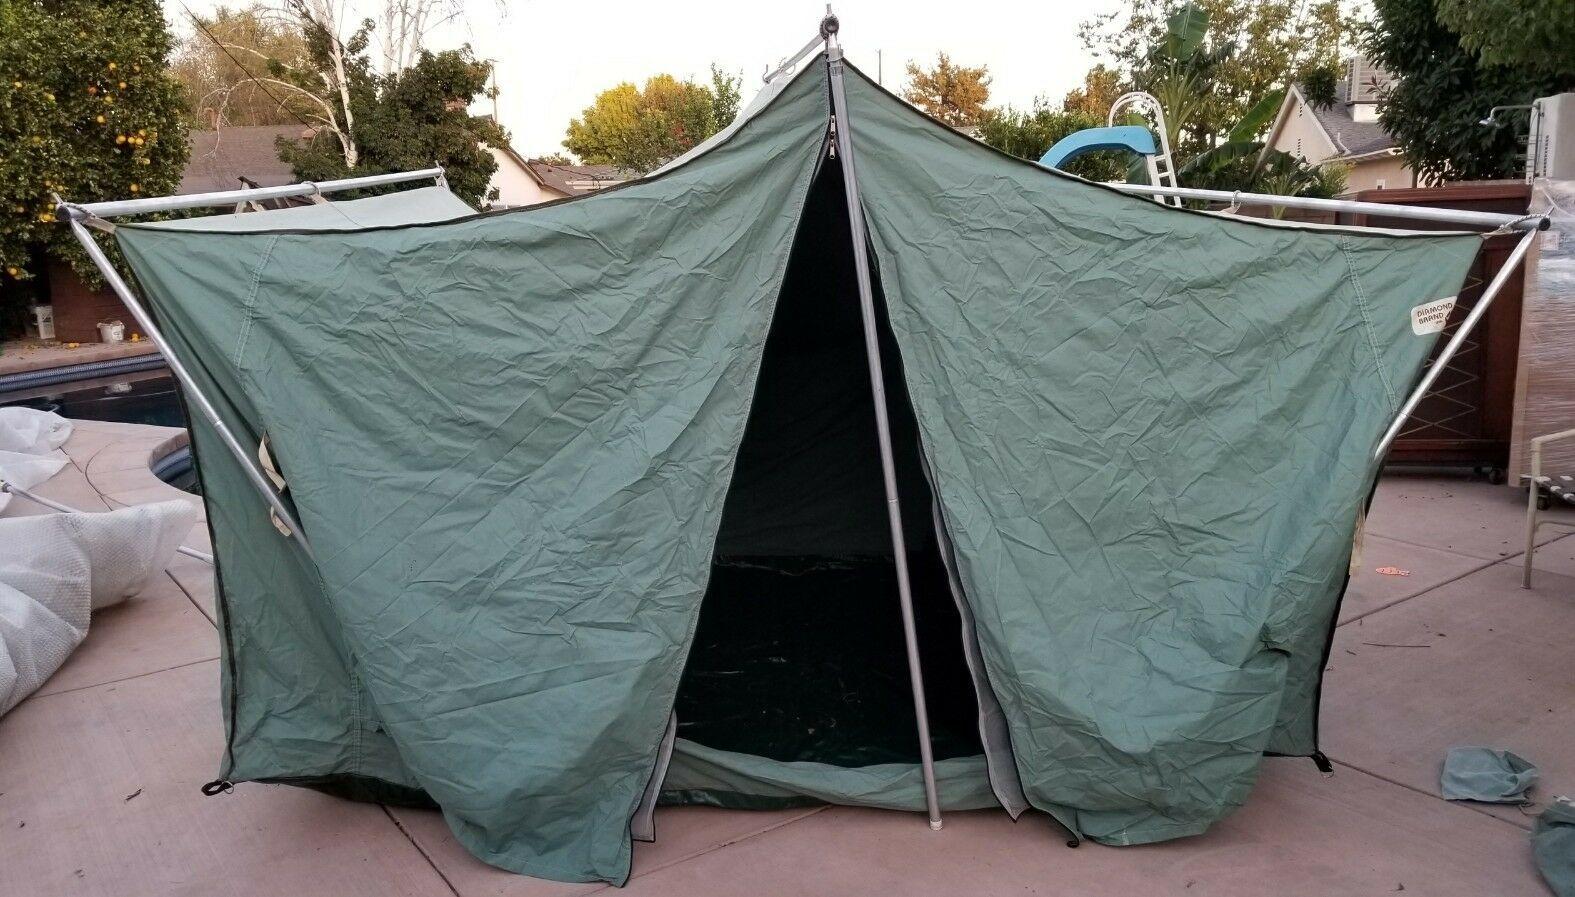 Vintage Canvas Diamond Brand Tent Canopy wPoles Shelter 3500